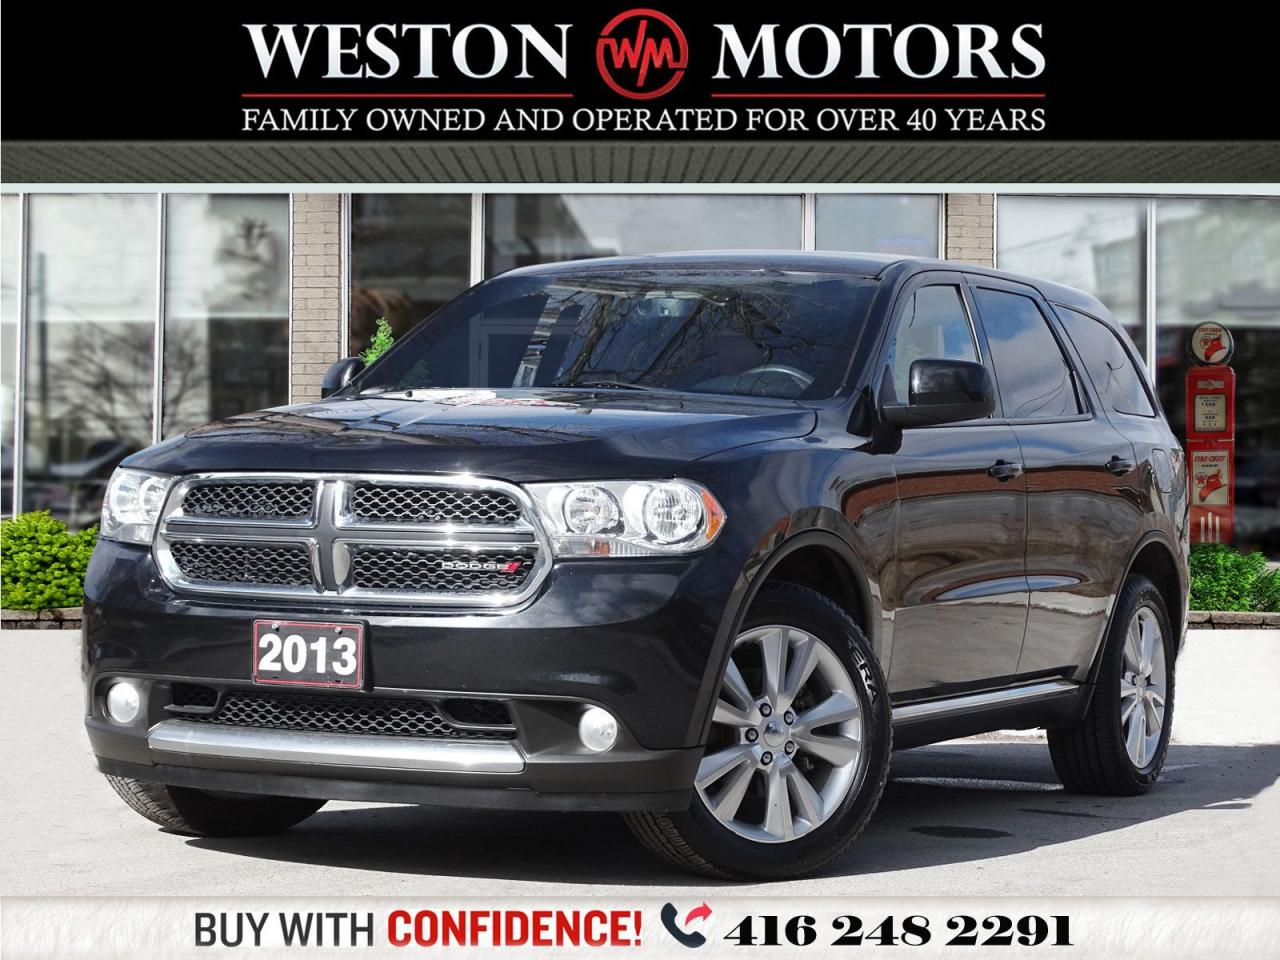 2013 Dodge Durango SXT*AWD*7PASS*AUX*A MUST SEE!!!*